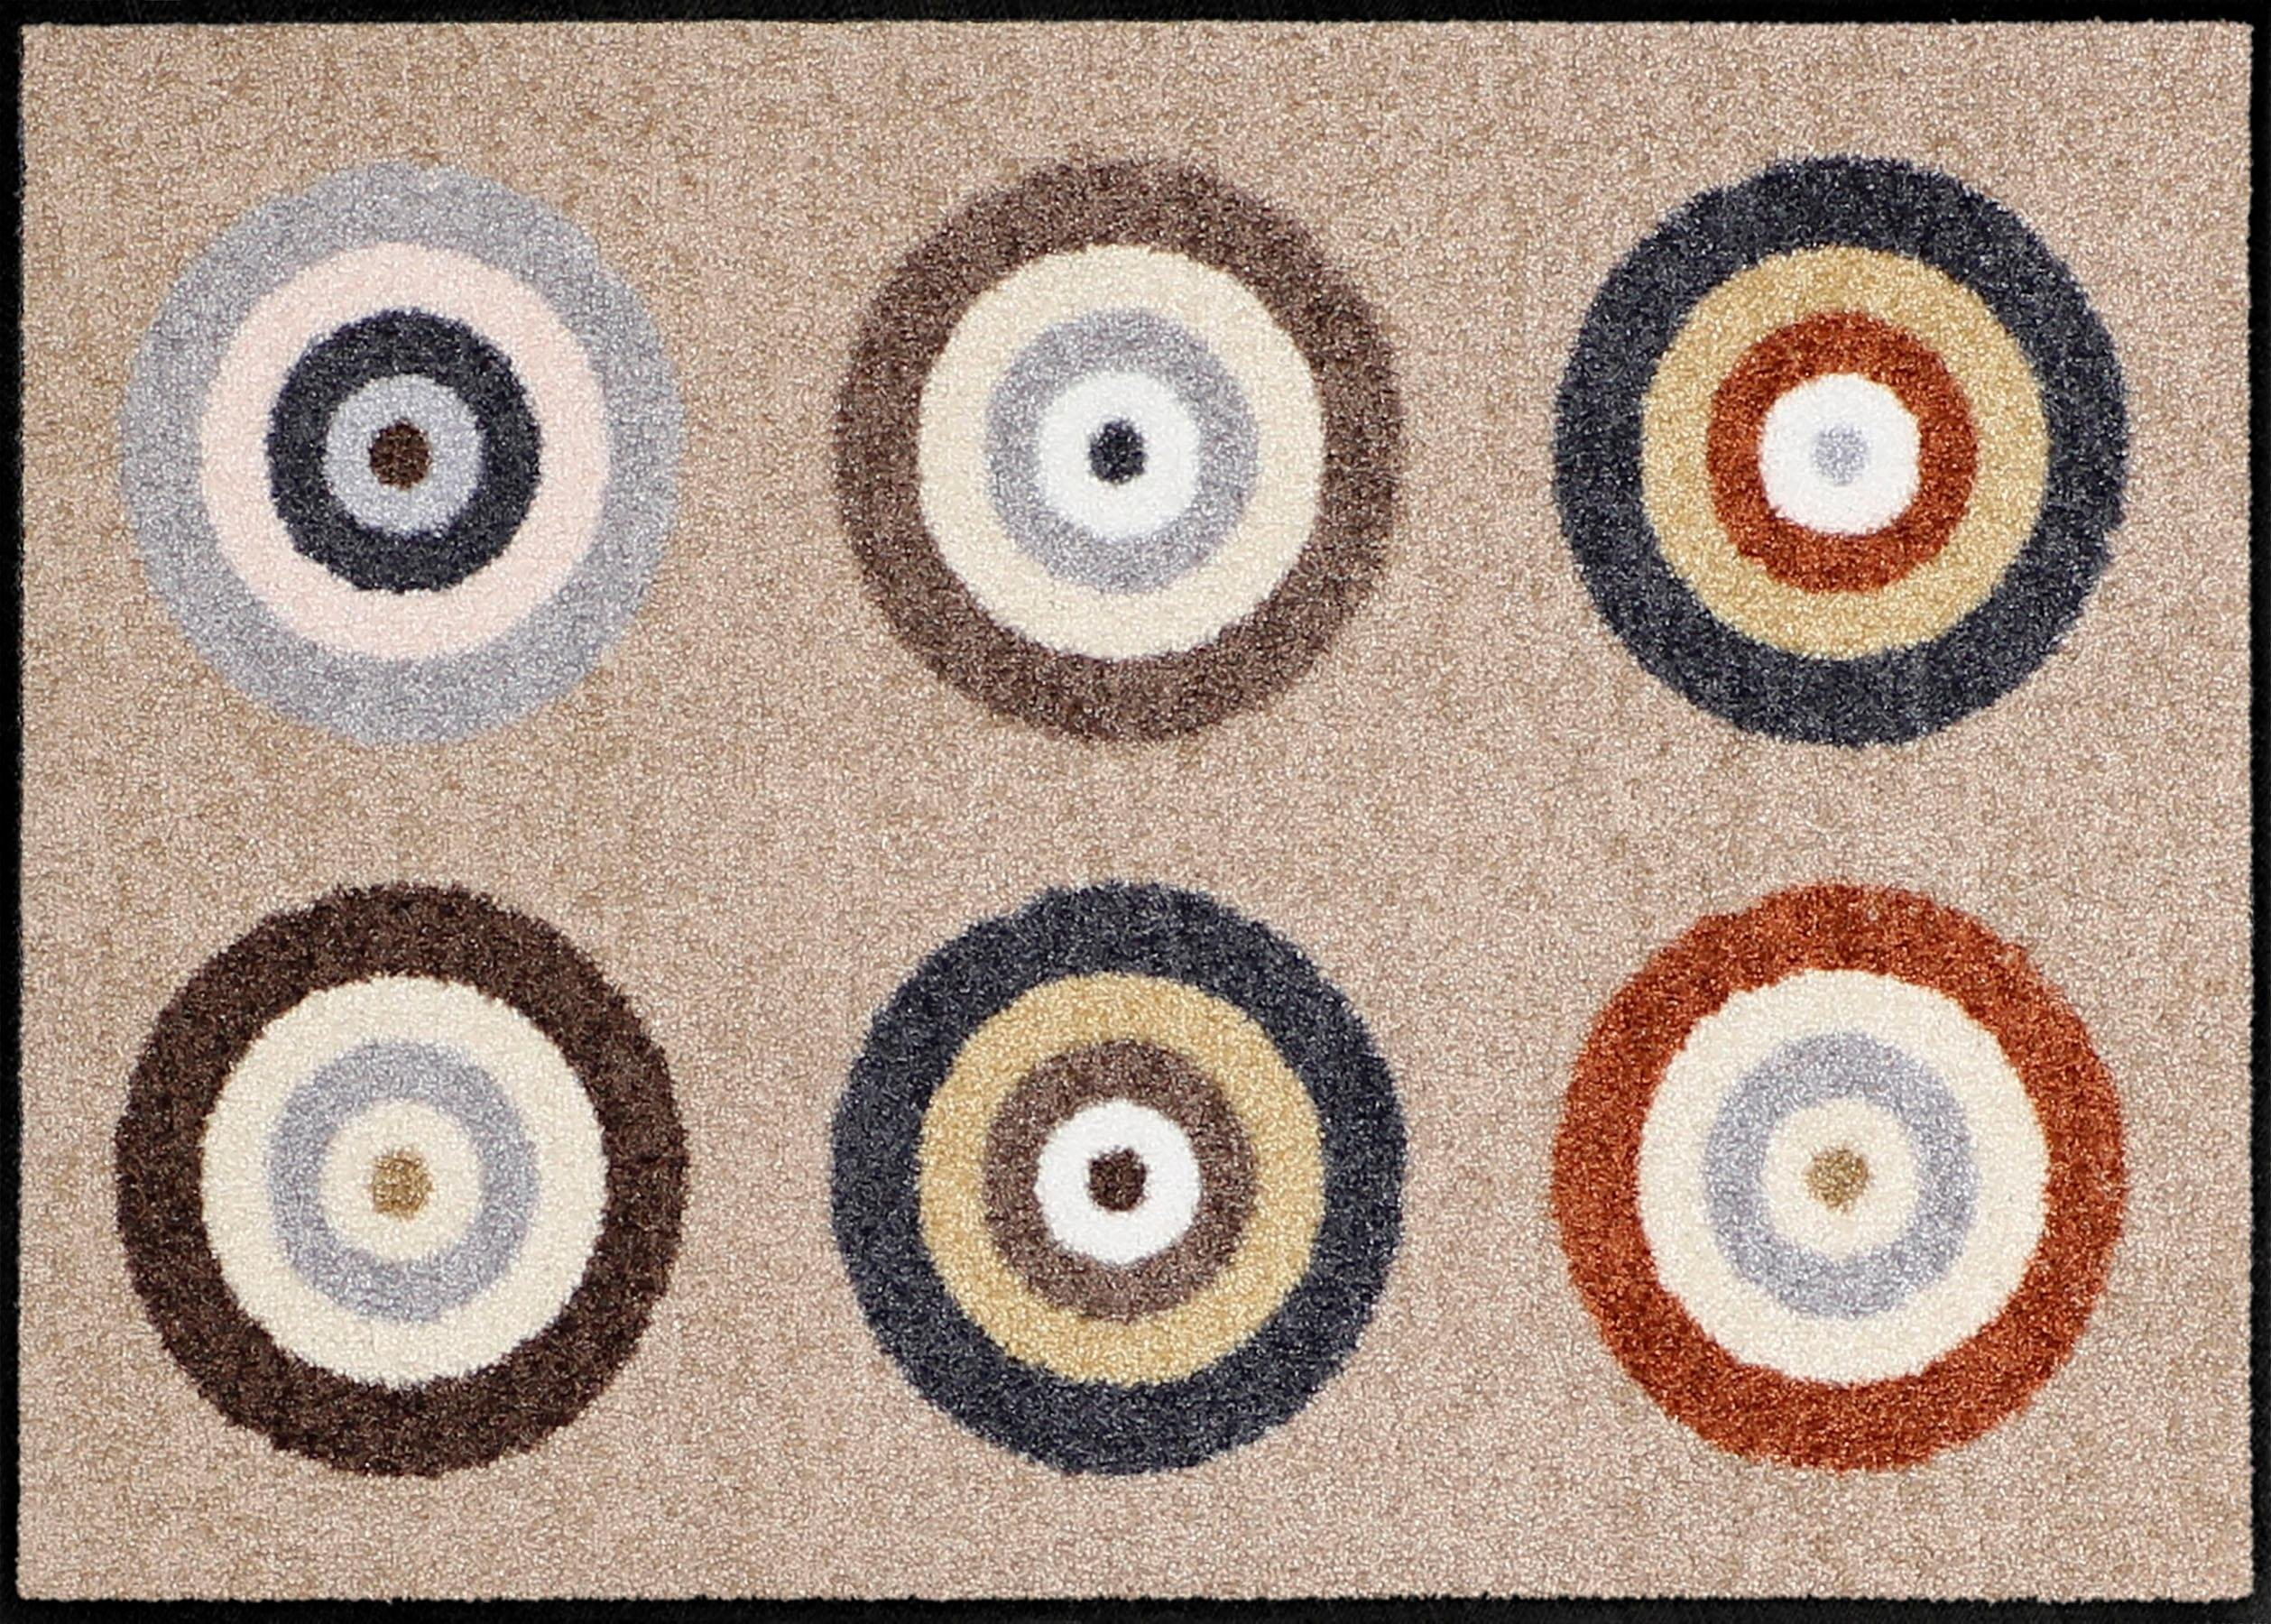 Fußmatte »Target«, Salonloewe, rechteckig, Höhe 6 mm | Heimtextilien > Fussmatten | Salonloewe